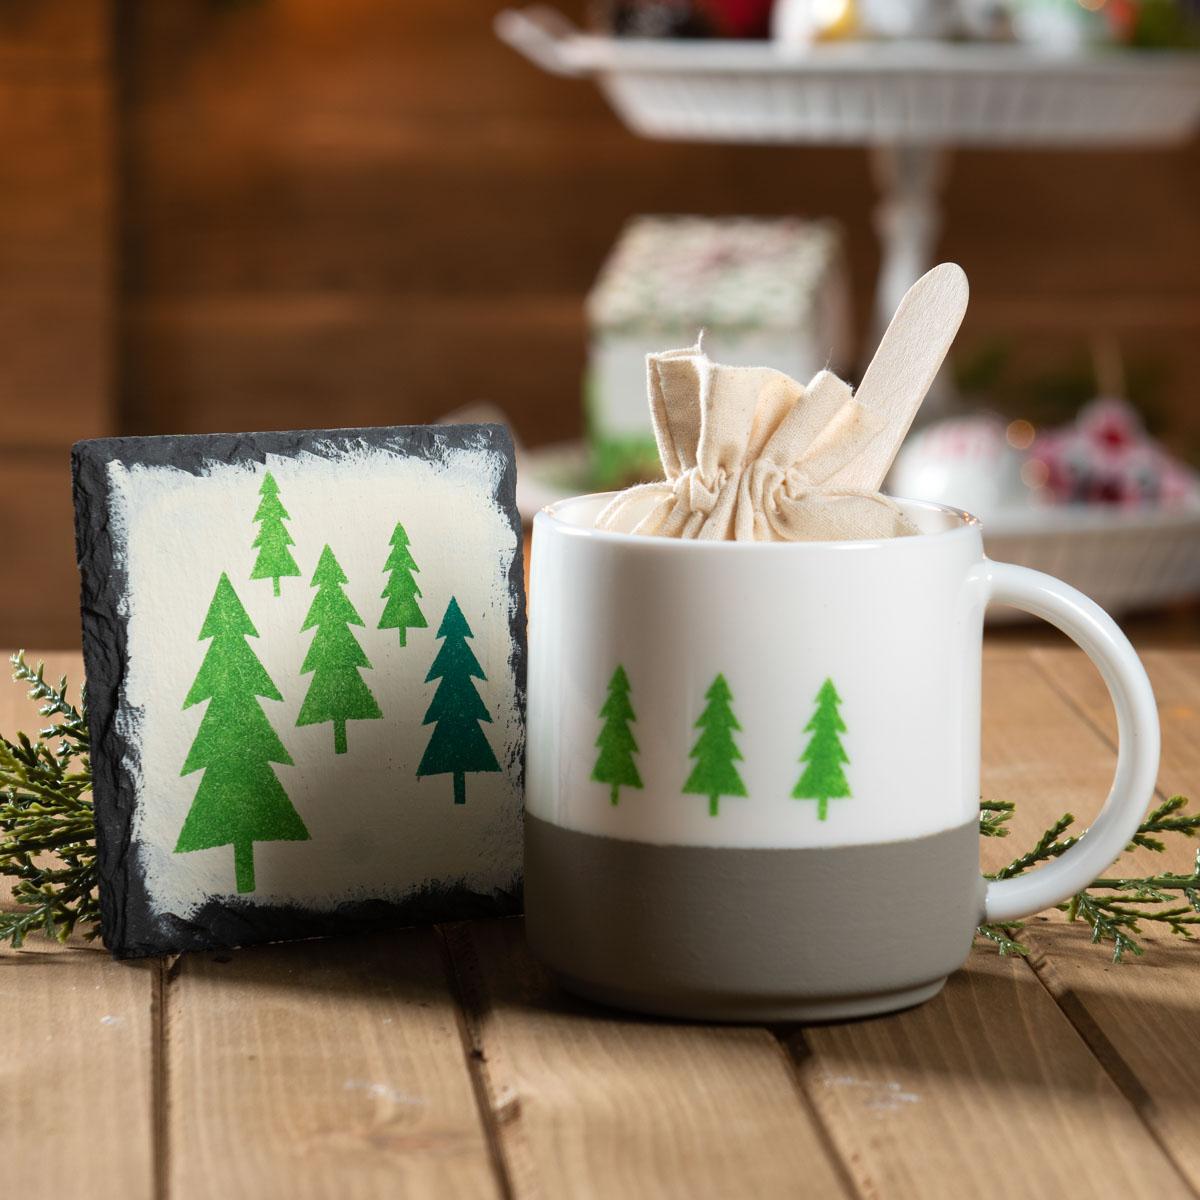 Holiday Tier Centerpiece - Canvas Gift Bag & Coaster Set